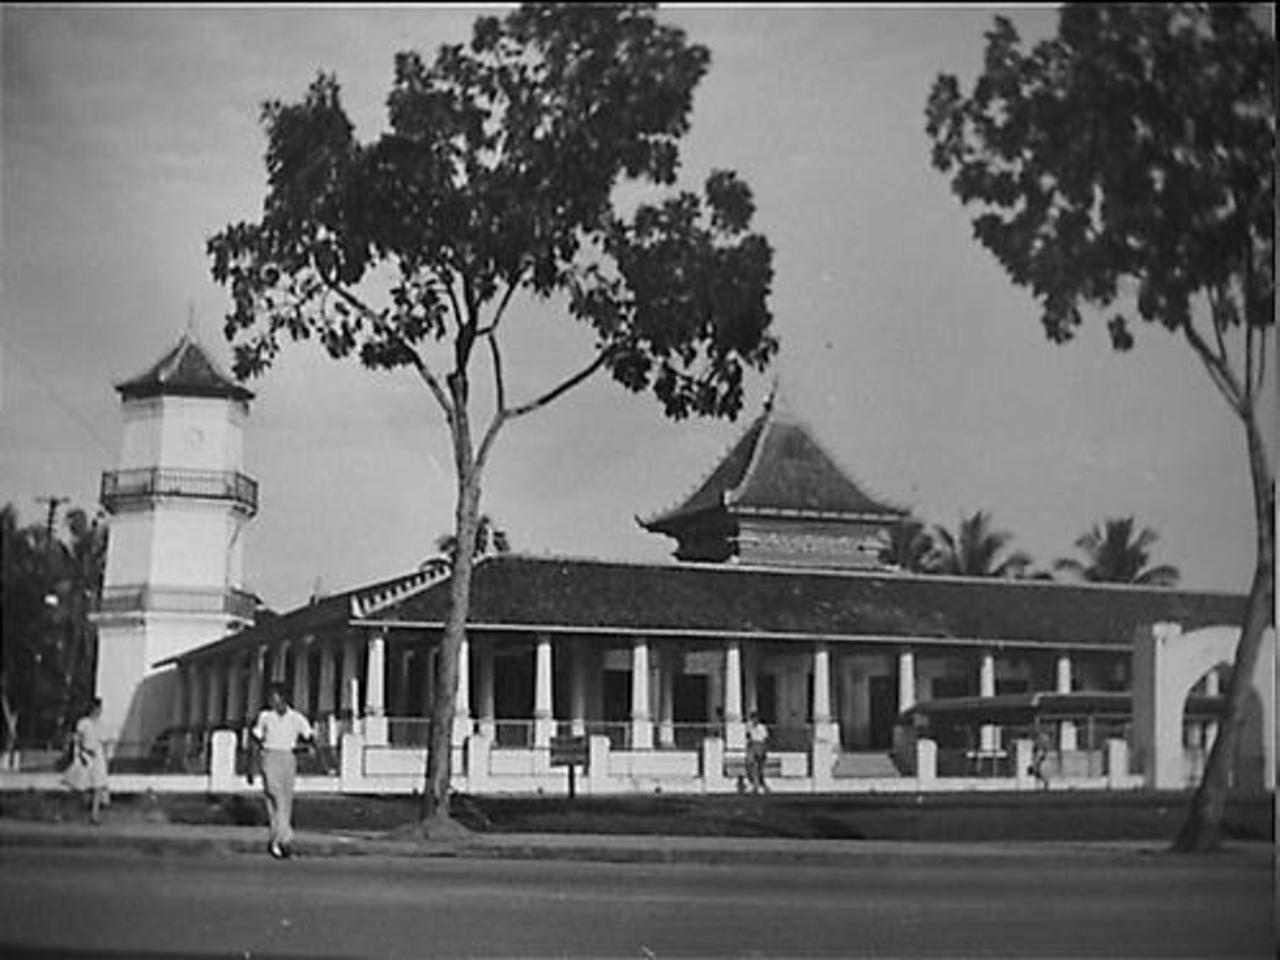 Palembang Seketsa Masjid Sultan Agung 1946 1950 Mahmud Badaruddin Kota